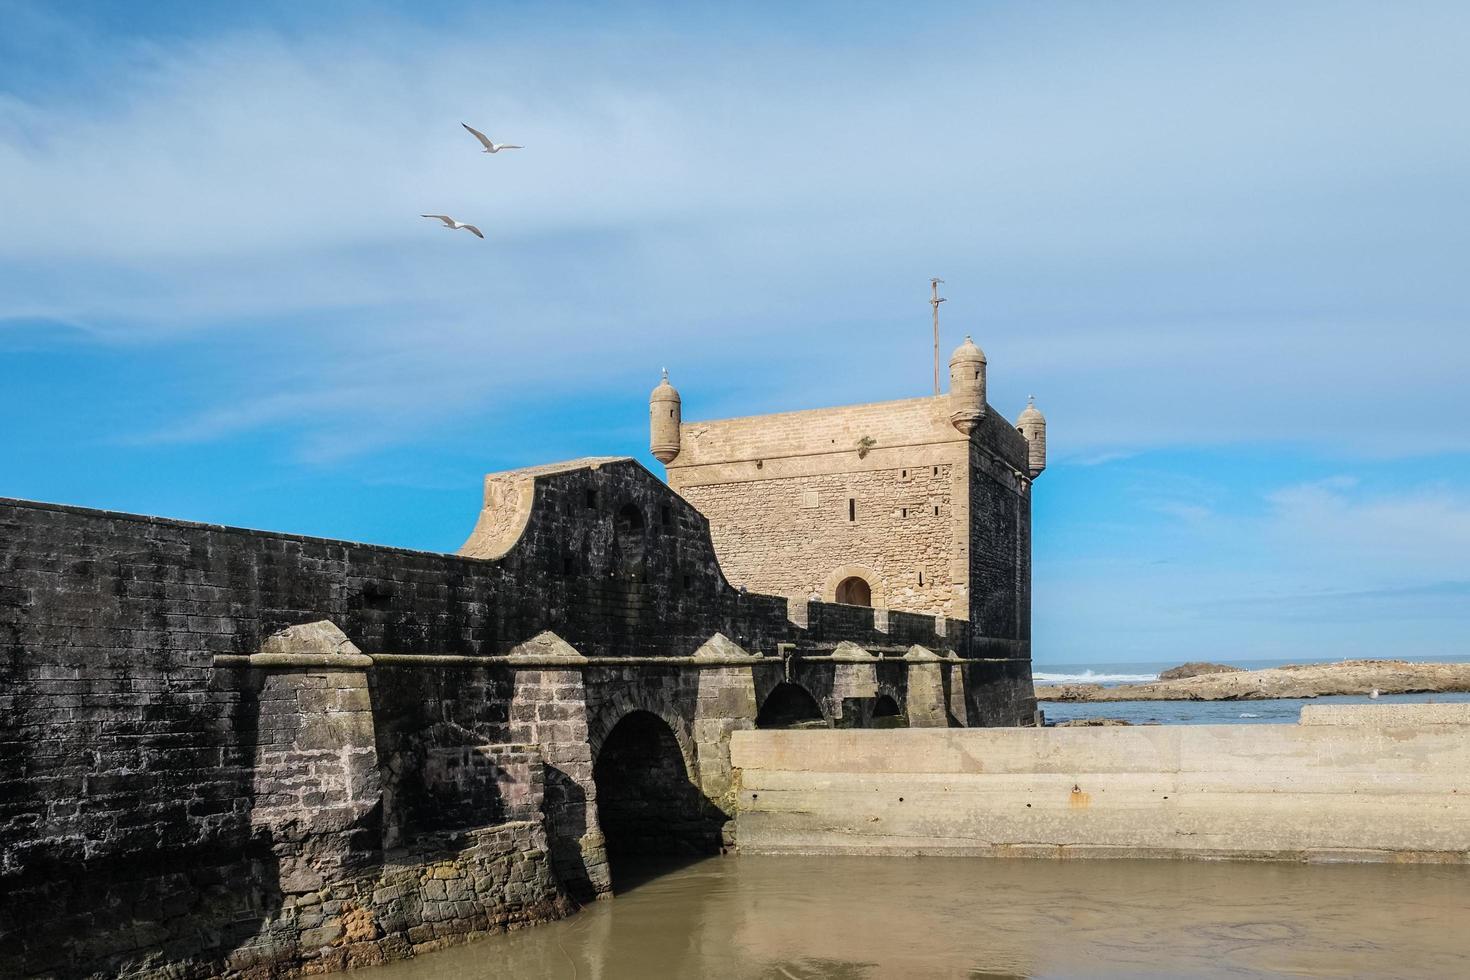 citadelle d'essaouira proche de l'océan atlantique photo